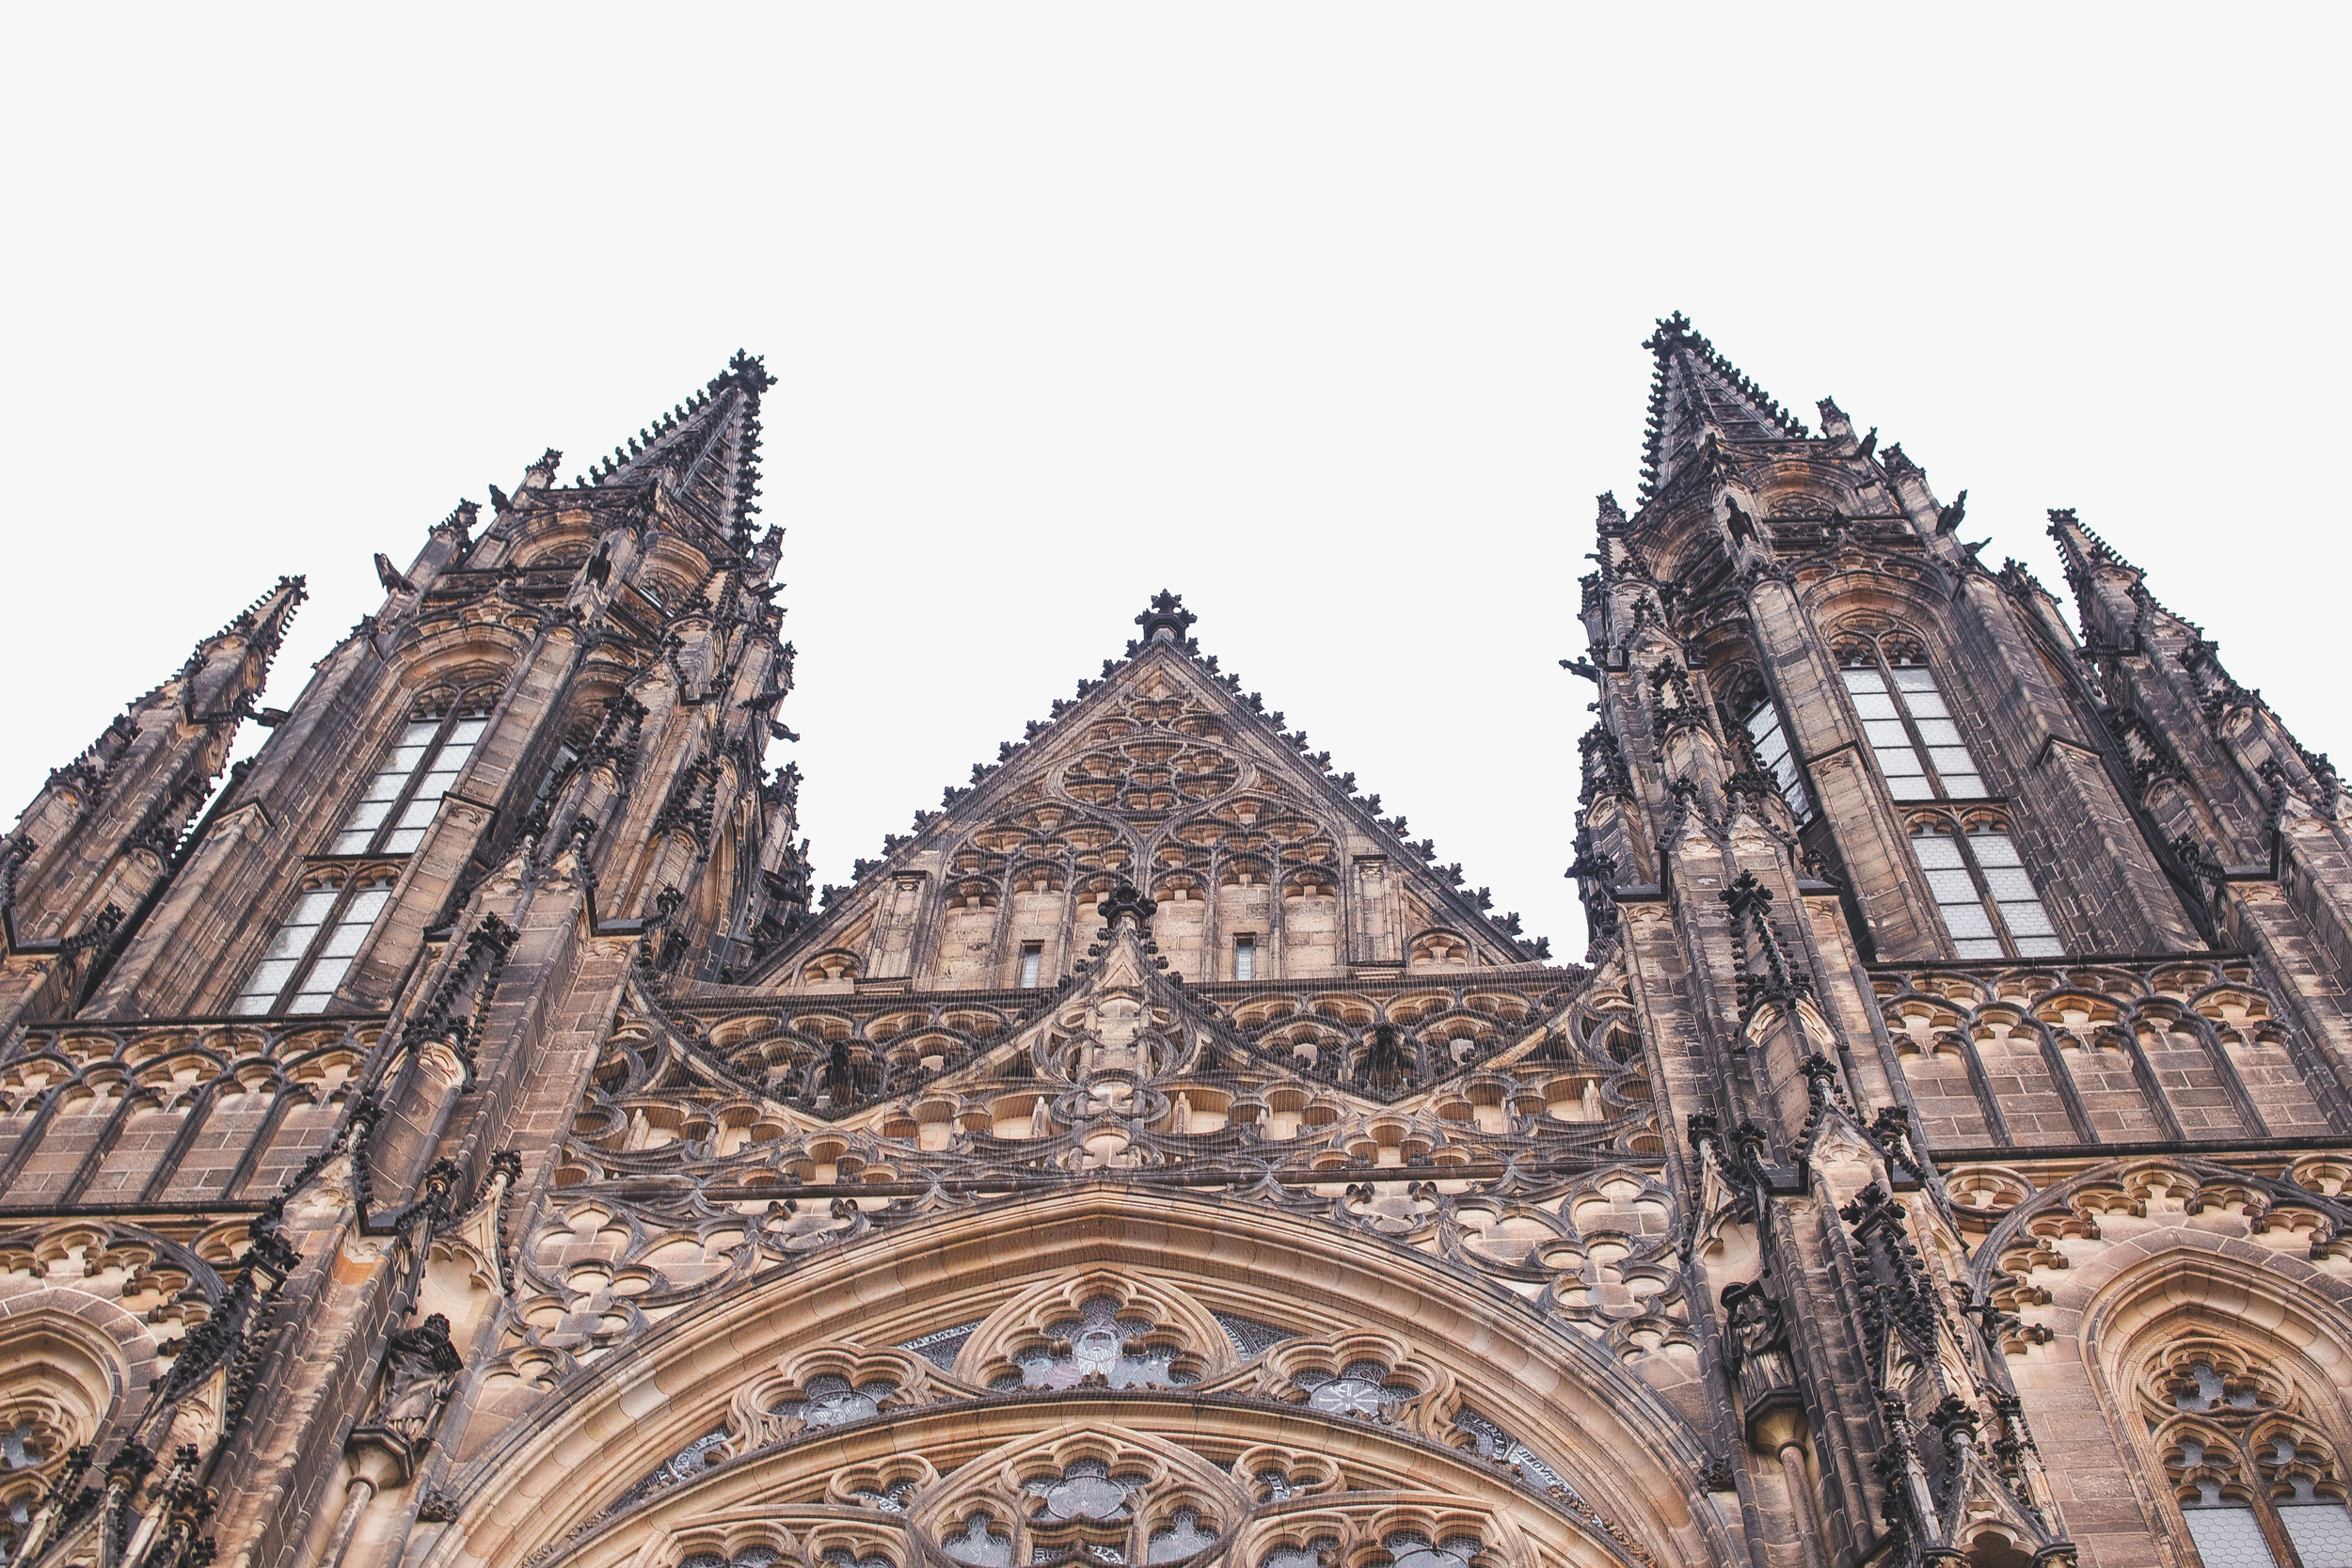 Looking up at Saint Vitus Catherdral